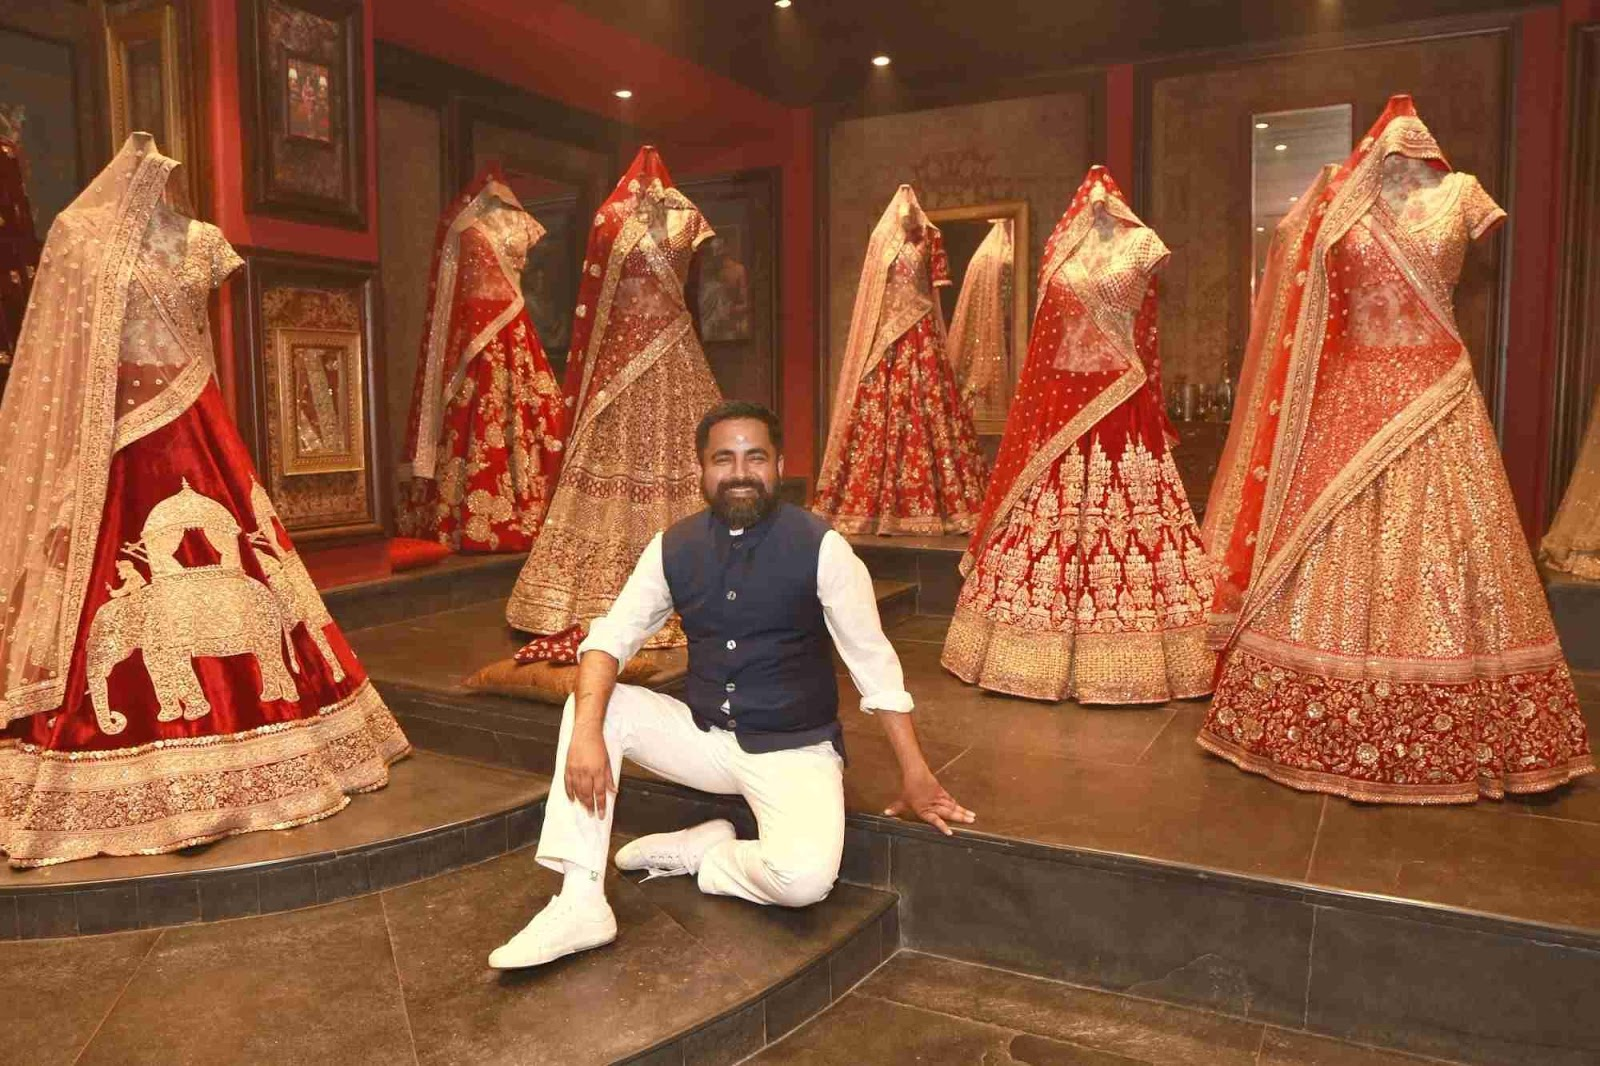 Fashion, Brand, Kareena kapoor, Deepika Padukone, Bollywood, Trend, subhyasachi mukherjee